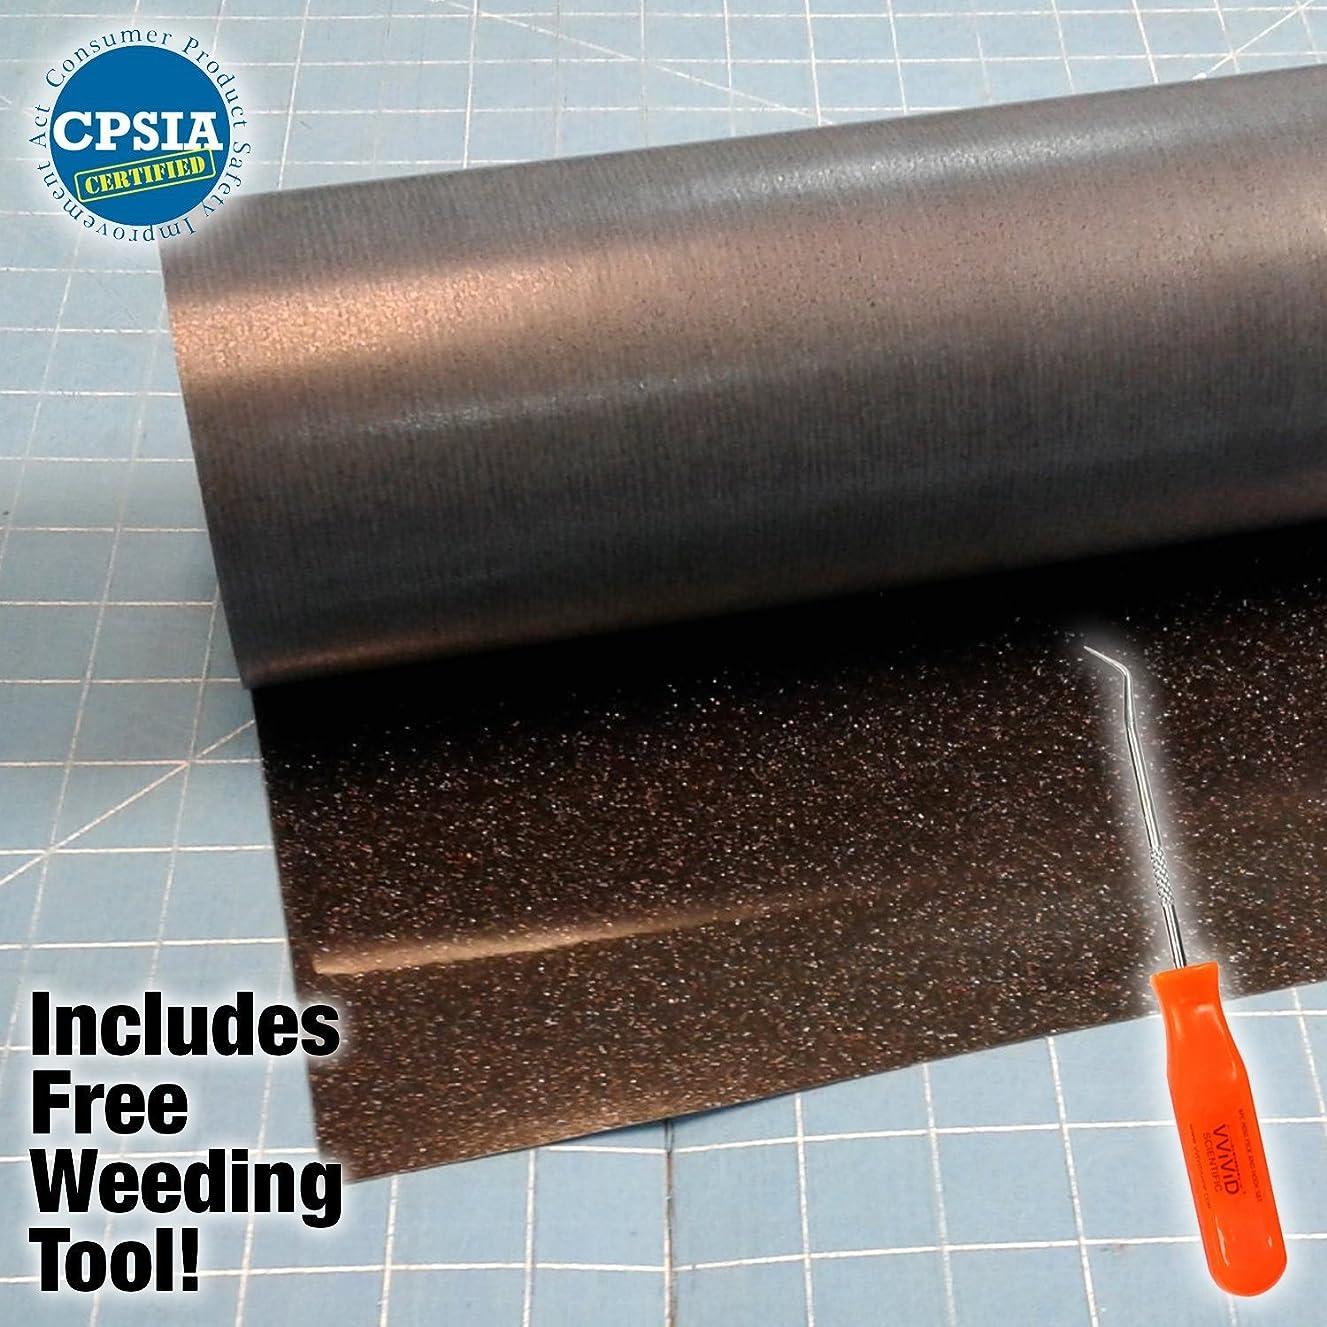 Siser Glitter Black Easyweed Heat Transfer Craft Vinyl Roll Including VViViD-Brand Stainless Steel Weeding Tool (5ft x 10